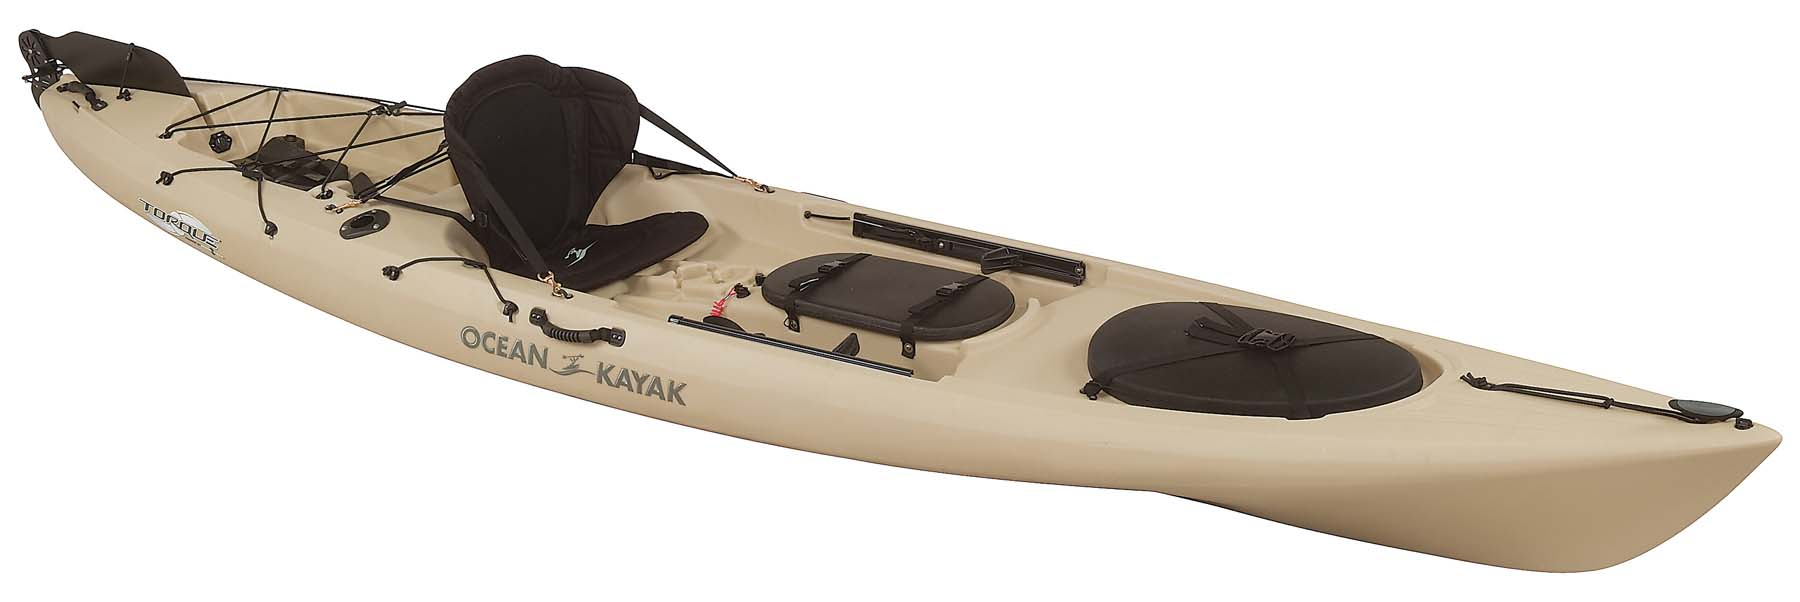 Ocean Kayak Torque for sale in Ephrata, PA  Lancaster County